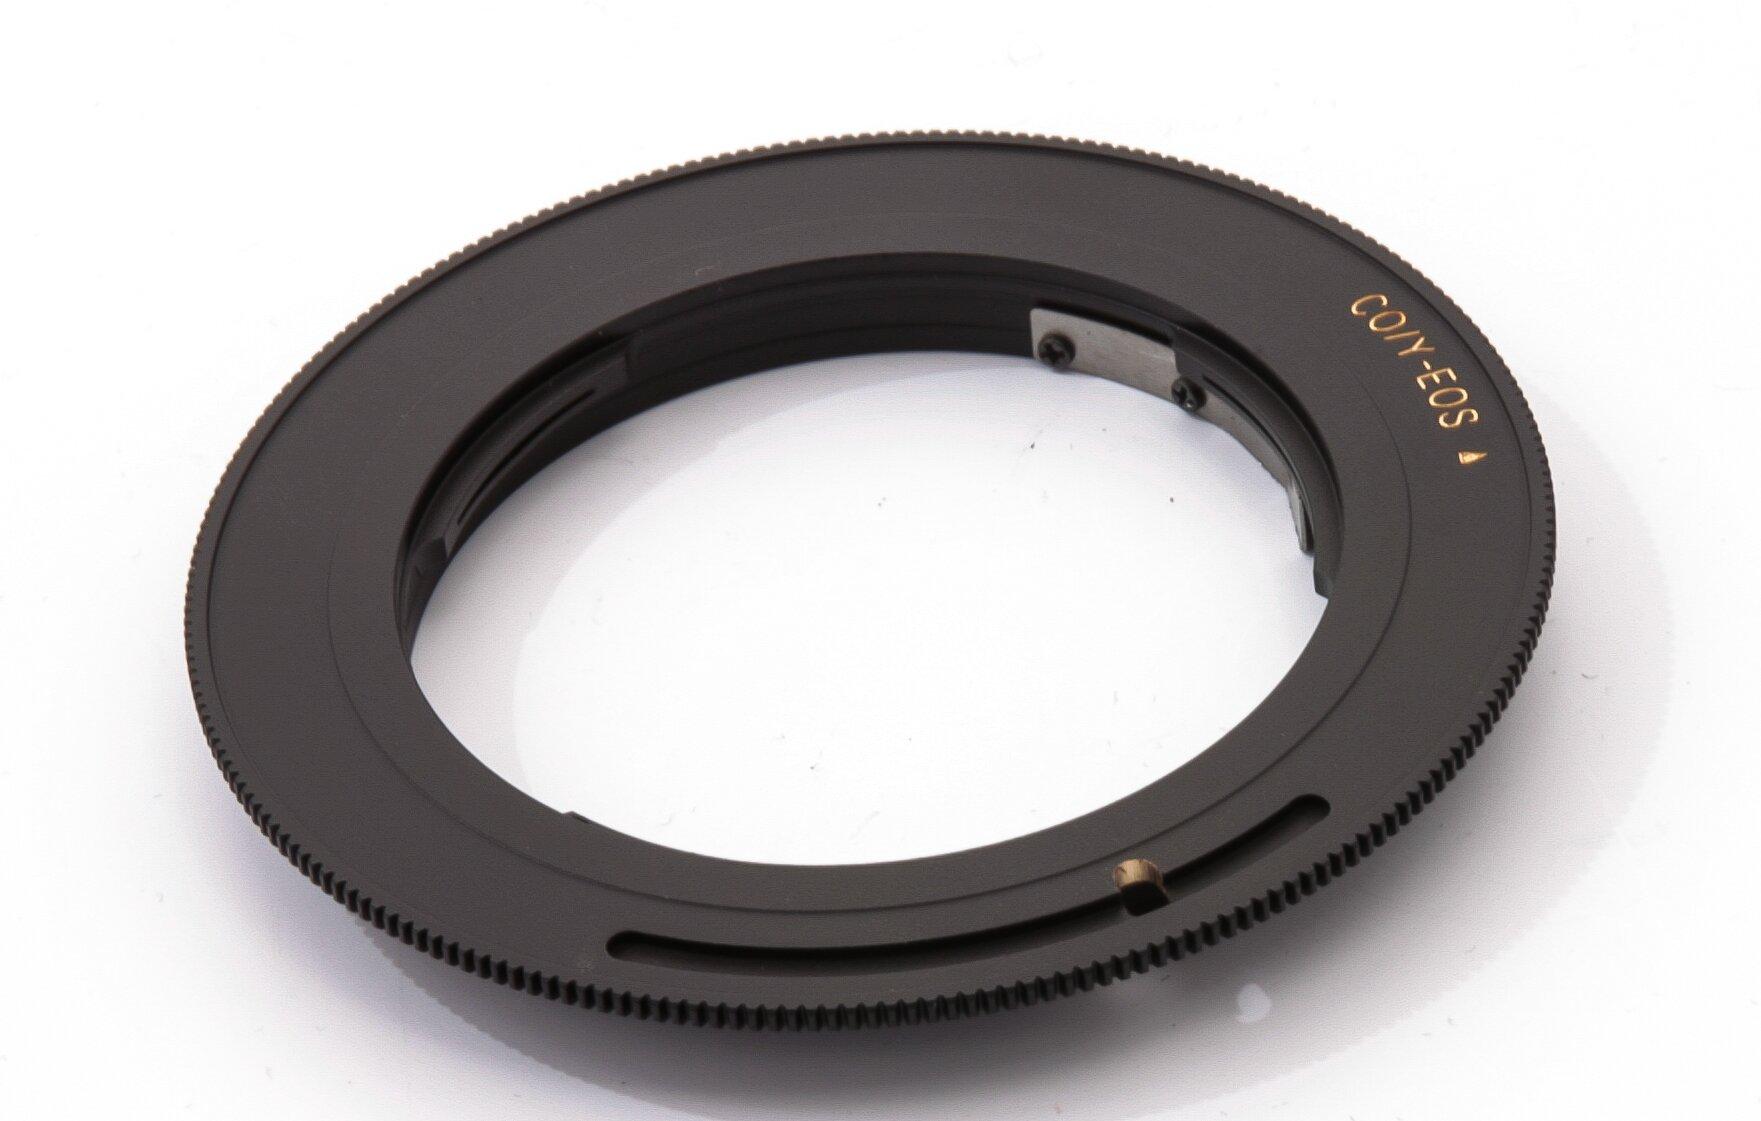 Adapter Contax RTS Objektive an Canon EOS Gehäuse